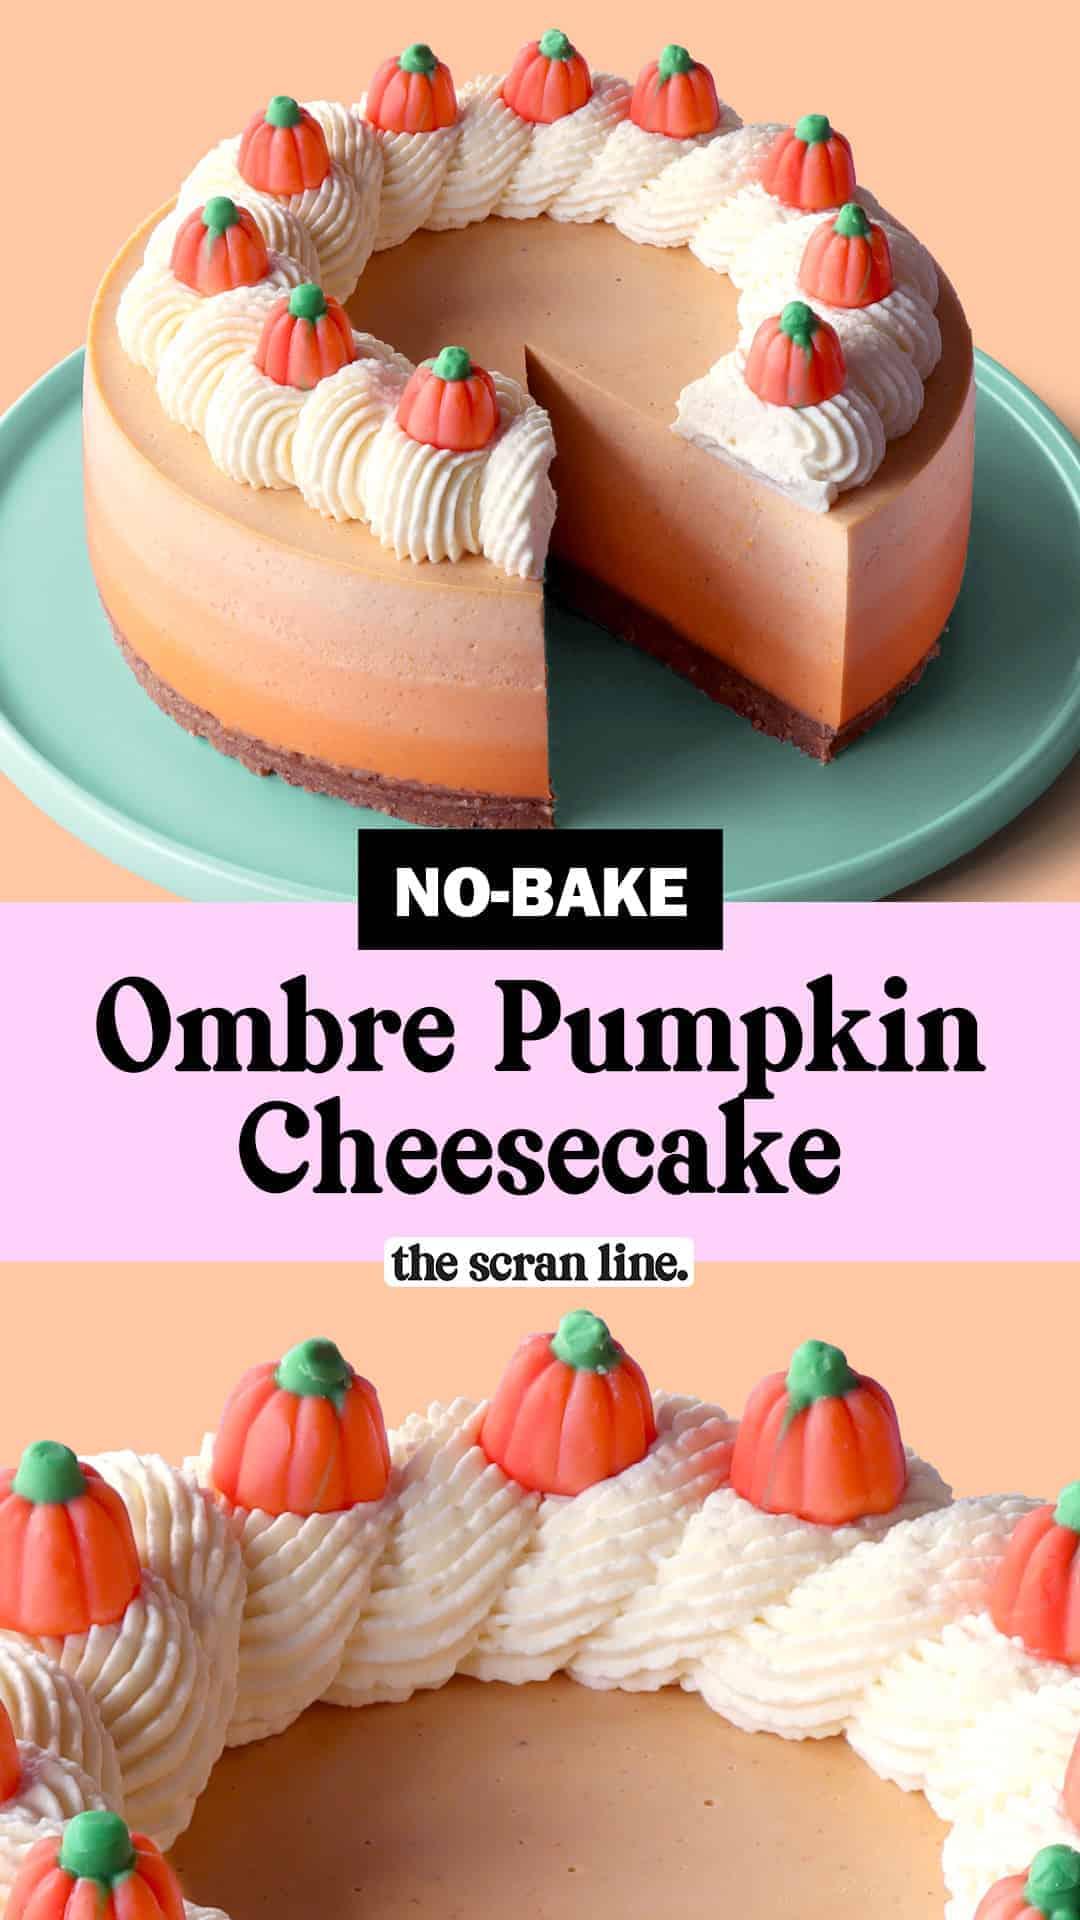 Pinterest Image For No-Bake Ombre Pumpkin Cheesecake